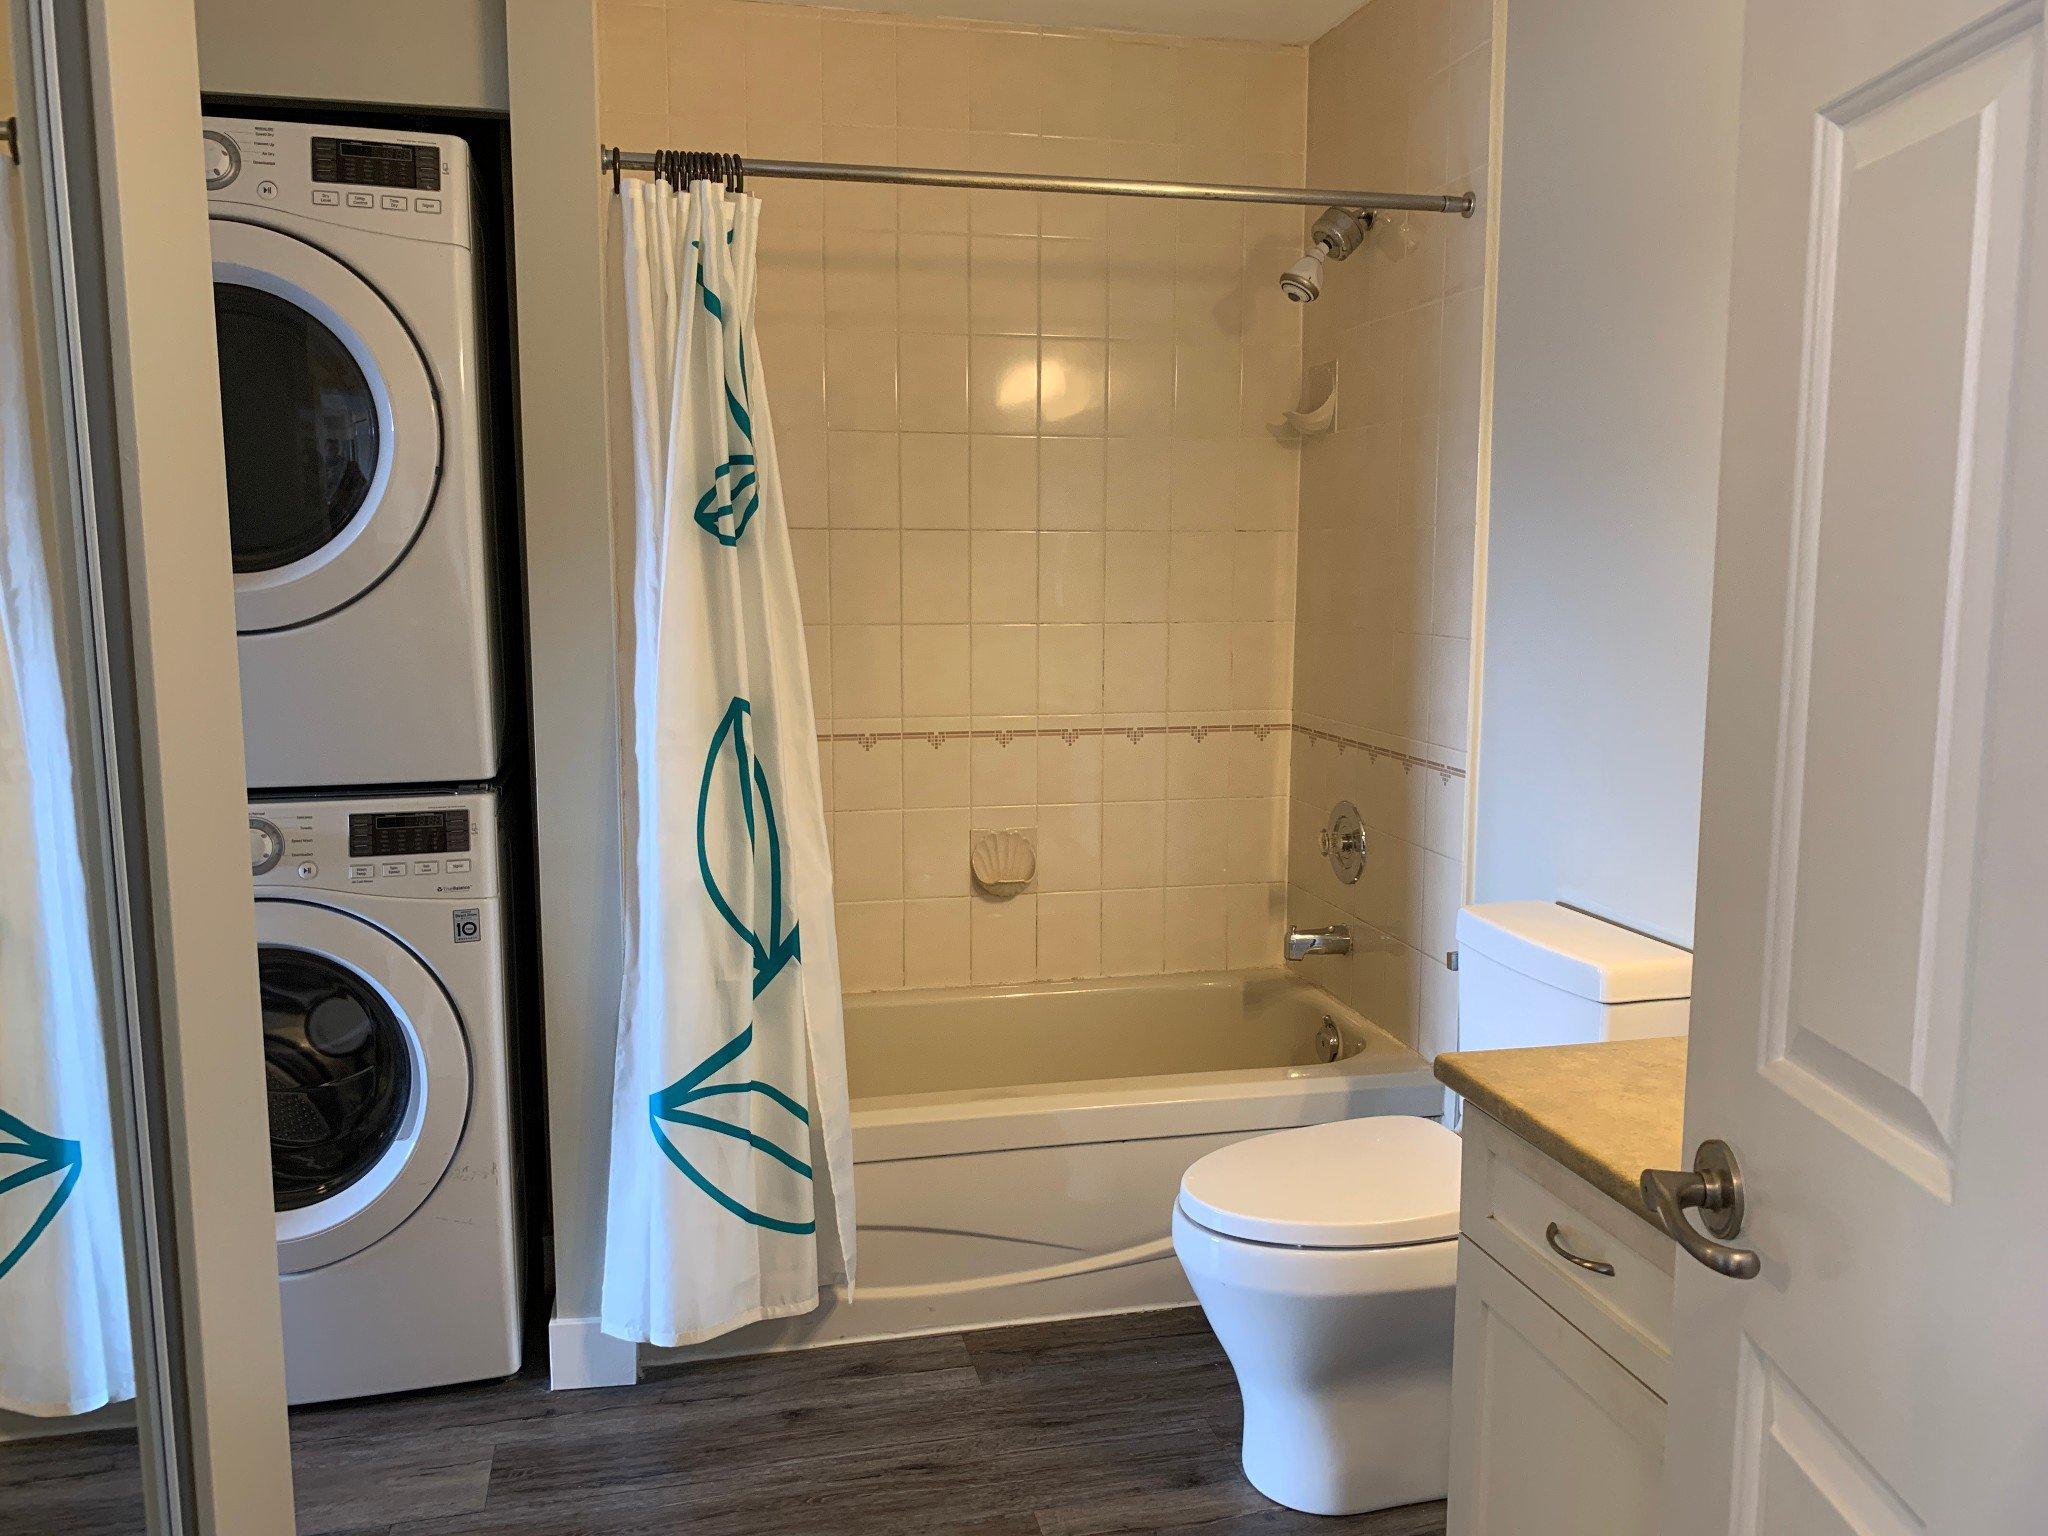 Photo 10: Photos: #510 2700 McCallum Rd. in Abbotsford: Central Abbotsford Condo for rent